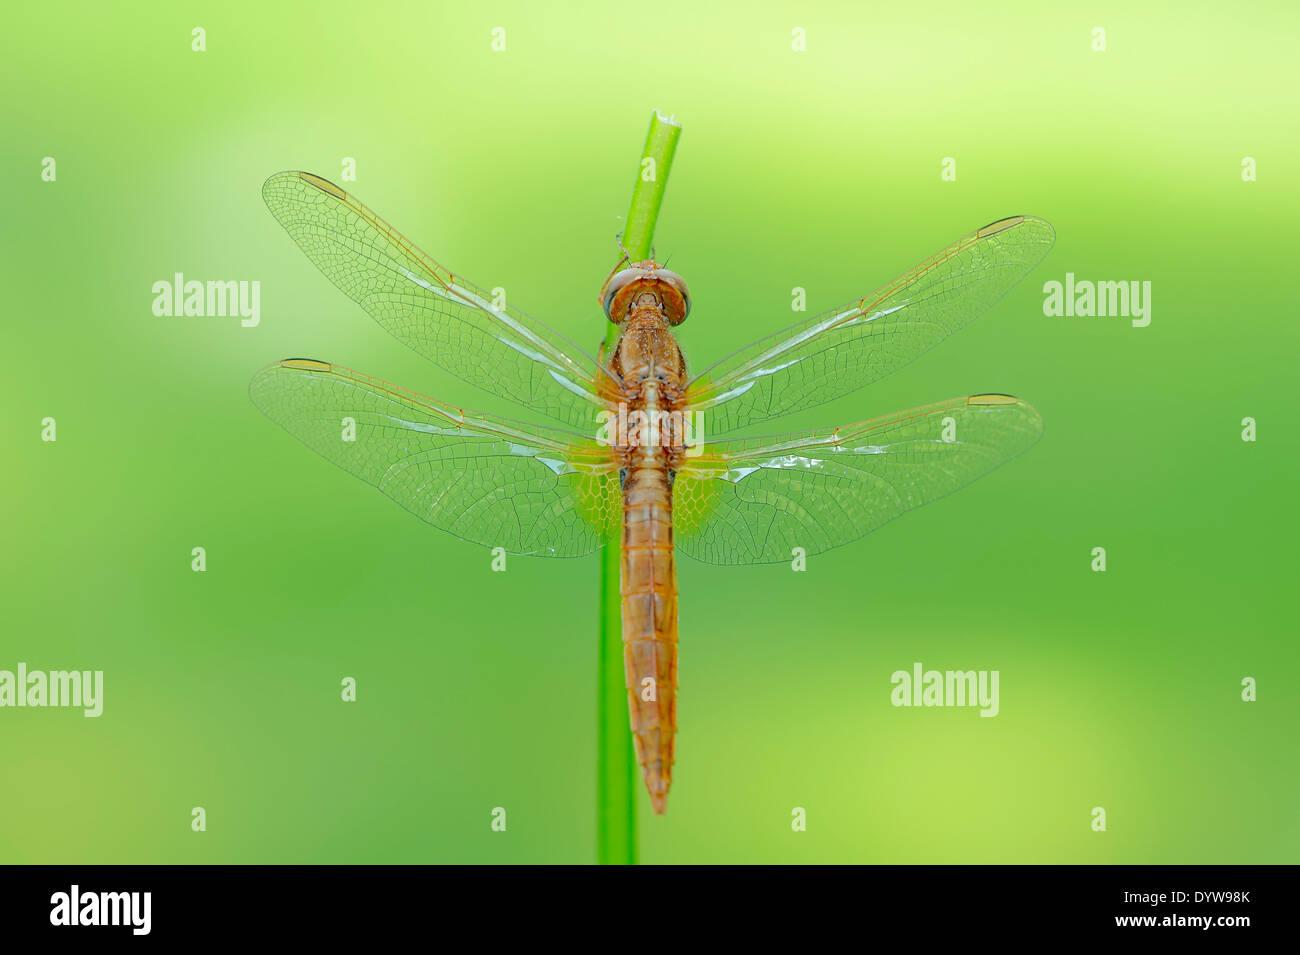 Scarlet Dragonfly, Scarlet Darter, Broad Scarlet or Red Dragonfly (Crocothemis erythraea), juvenile, male Stock Photo